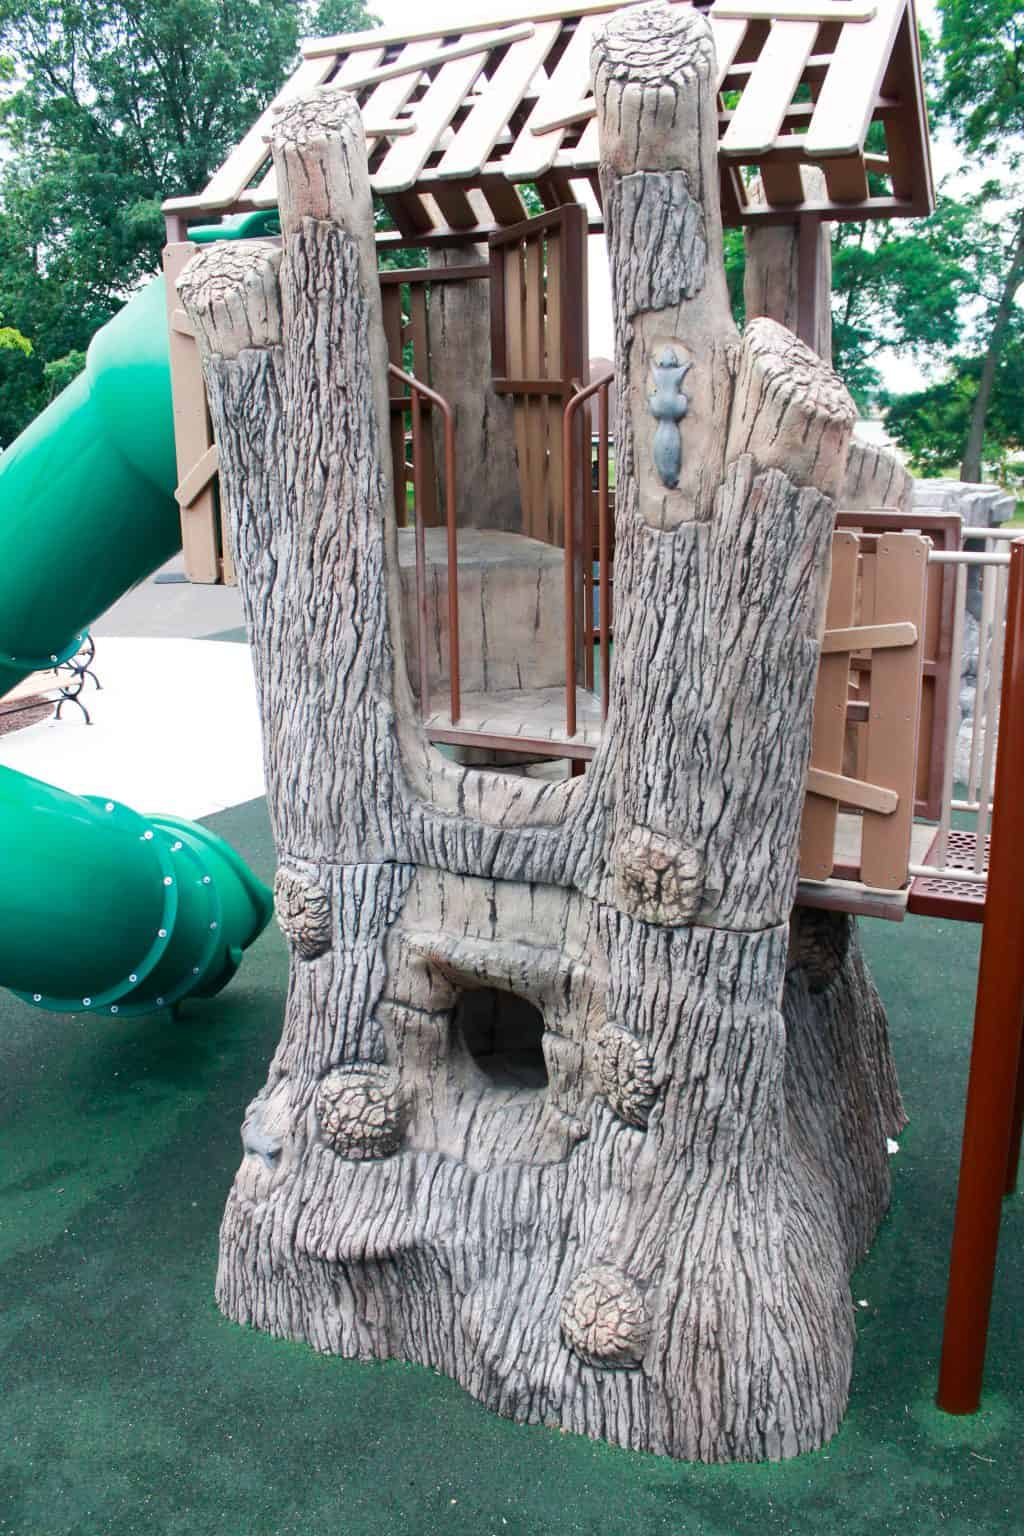 windward-beach-park-playground-brick-nj_28266702665_o-1024x1536